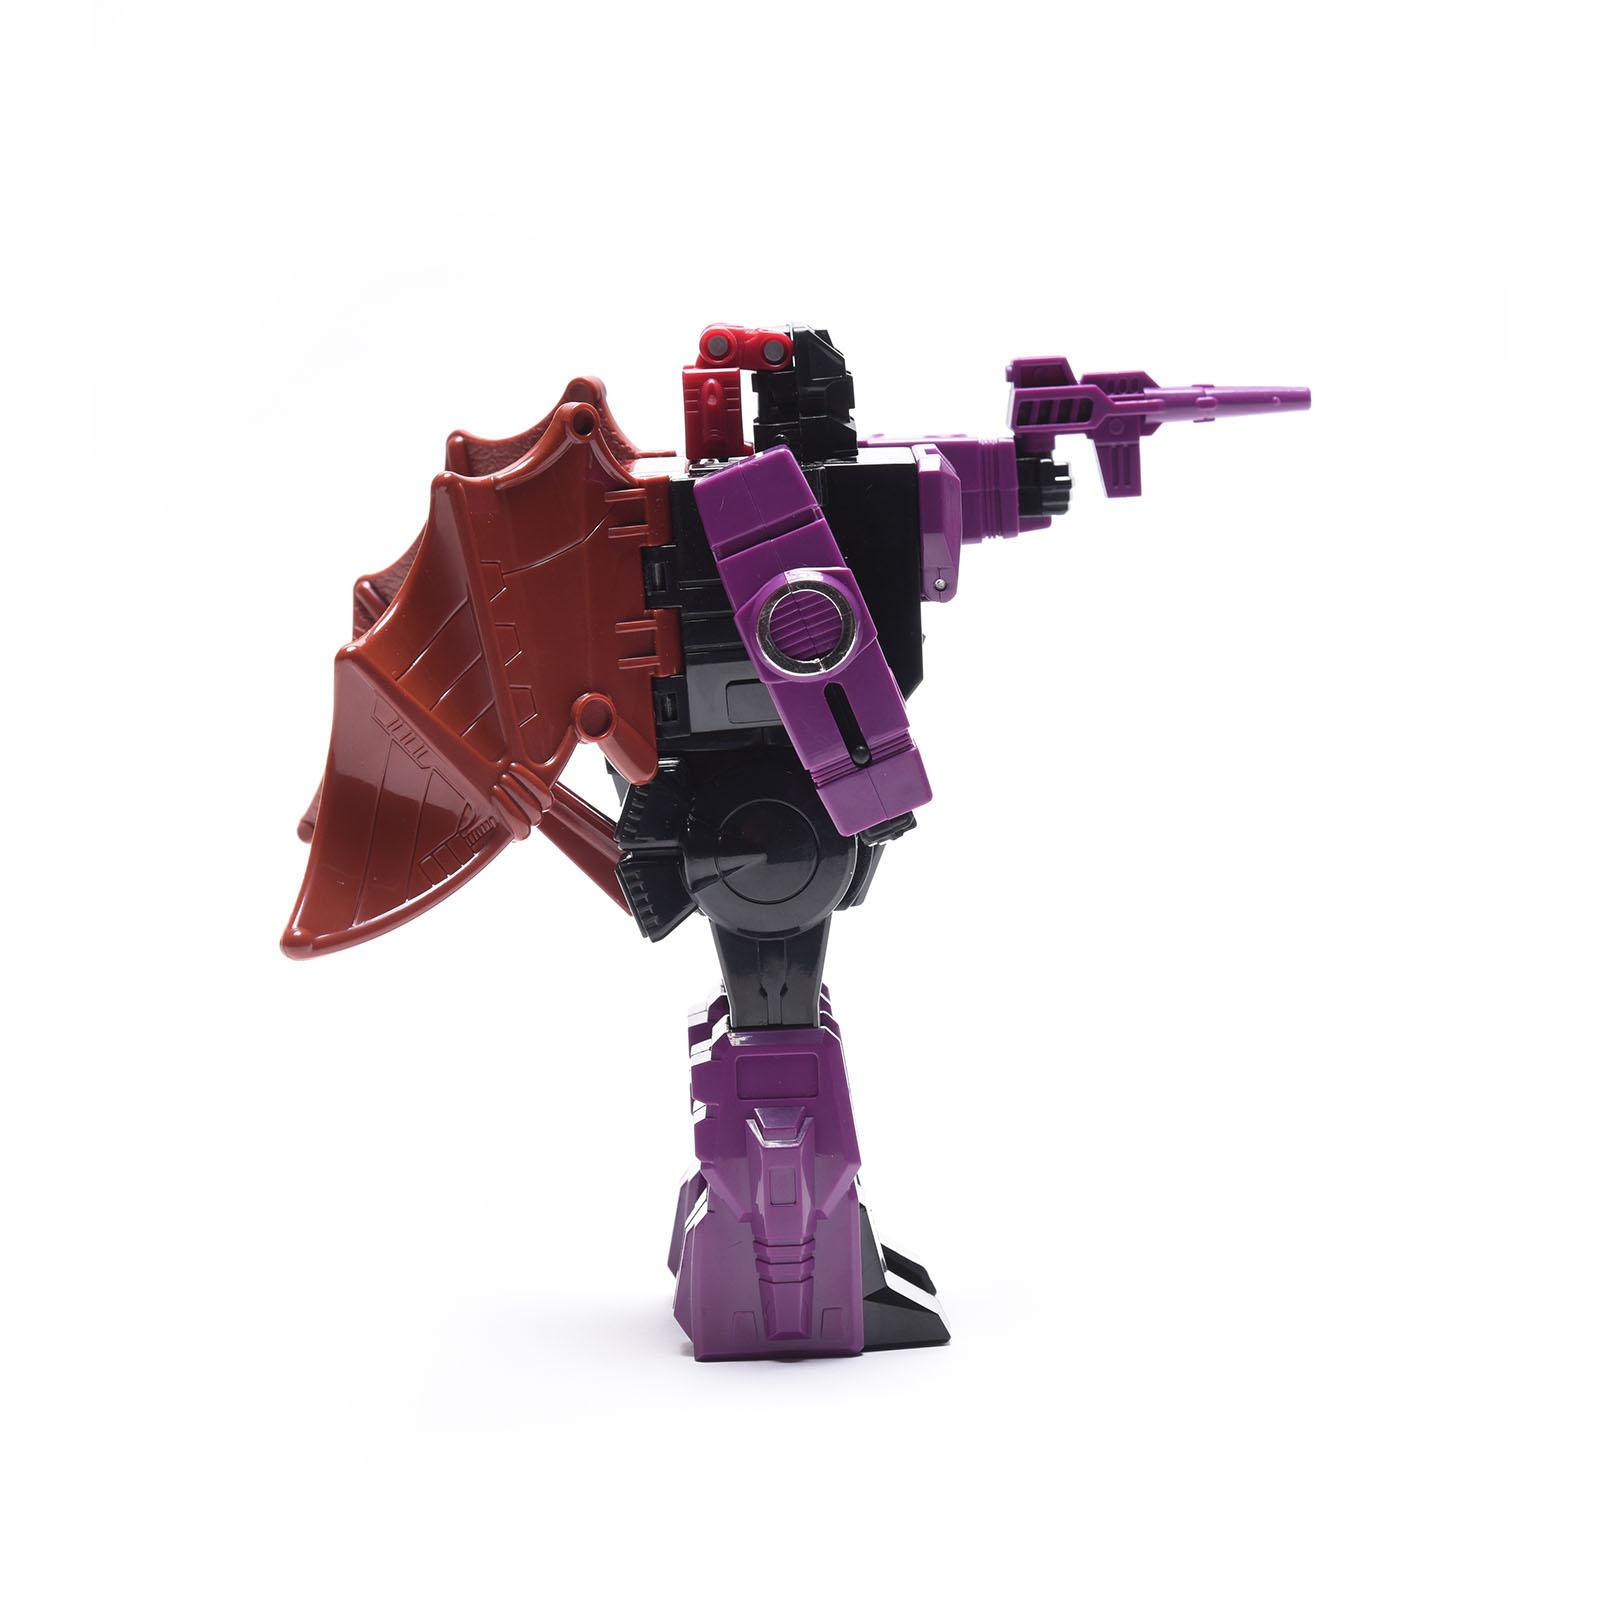 Transformer G1 Mindwipe reissue brand new Gift